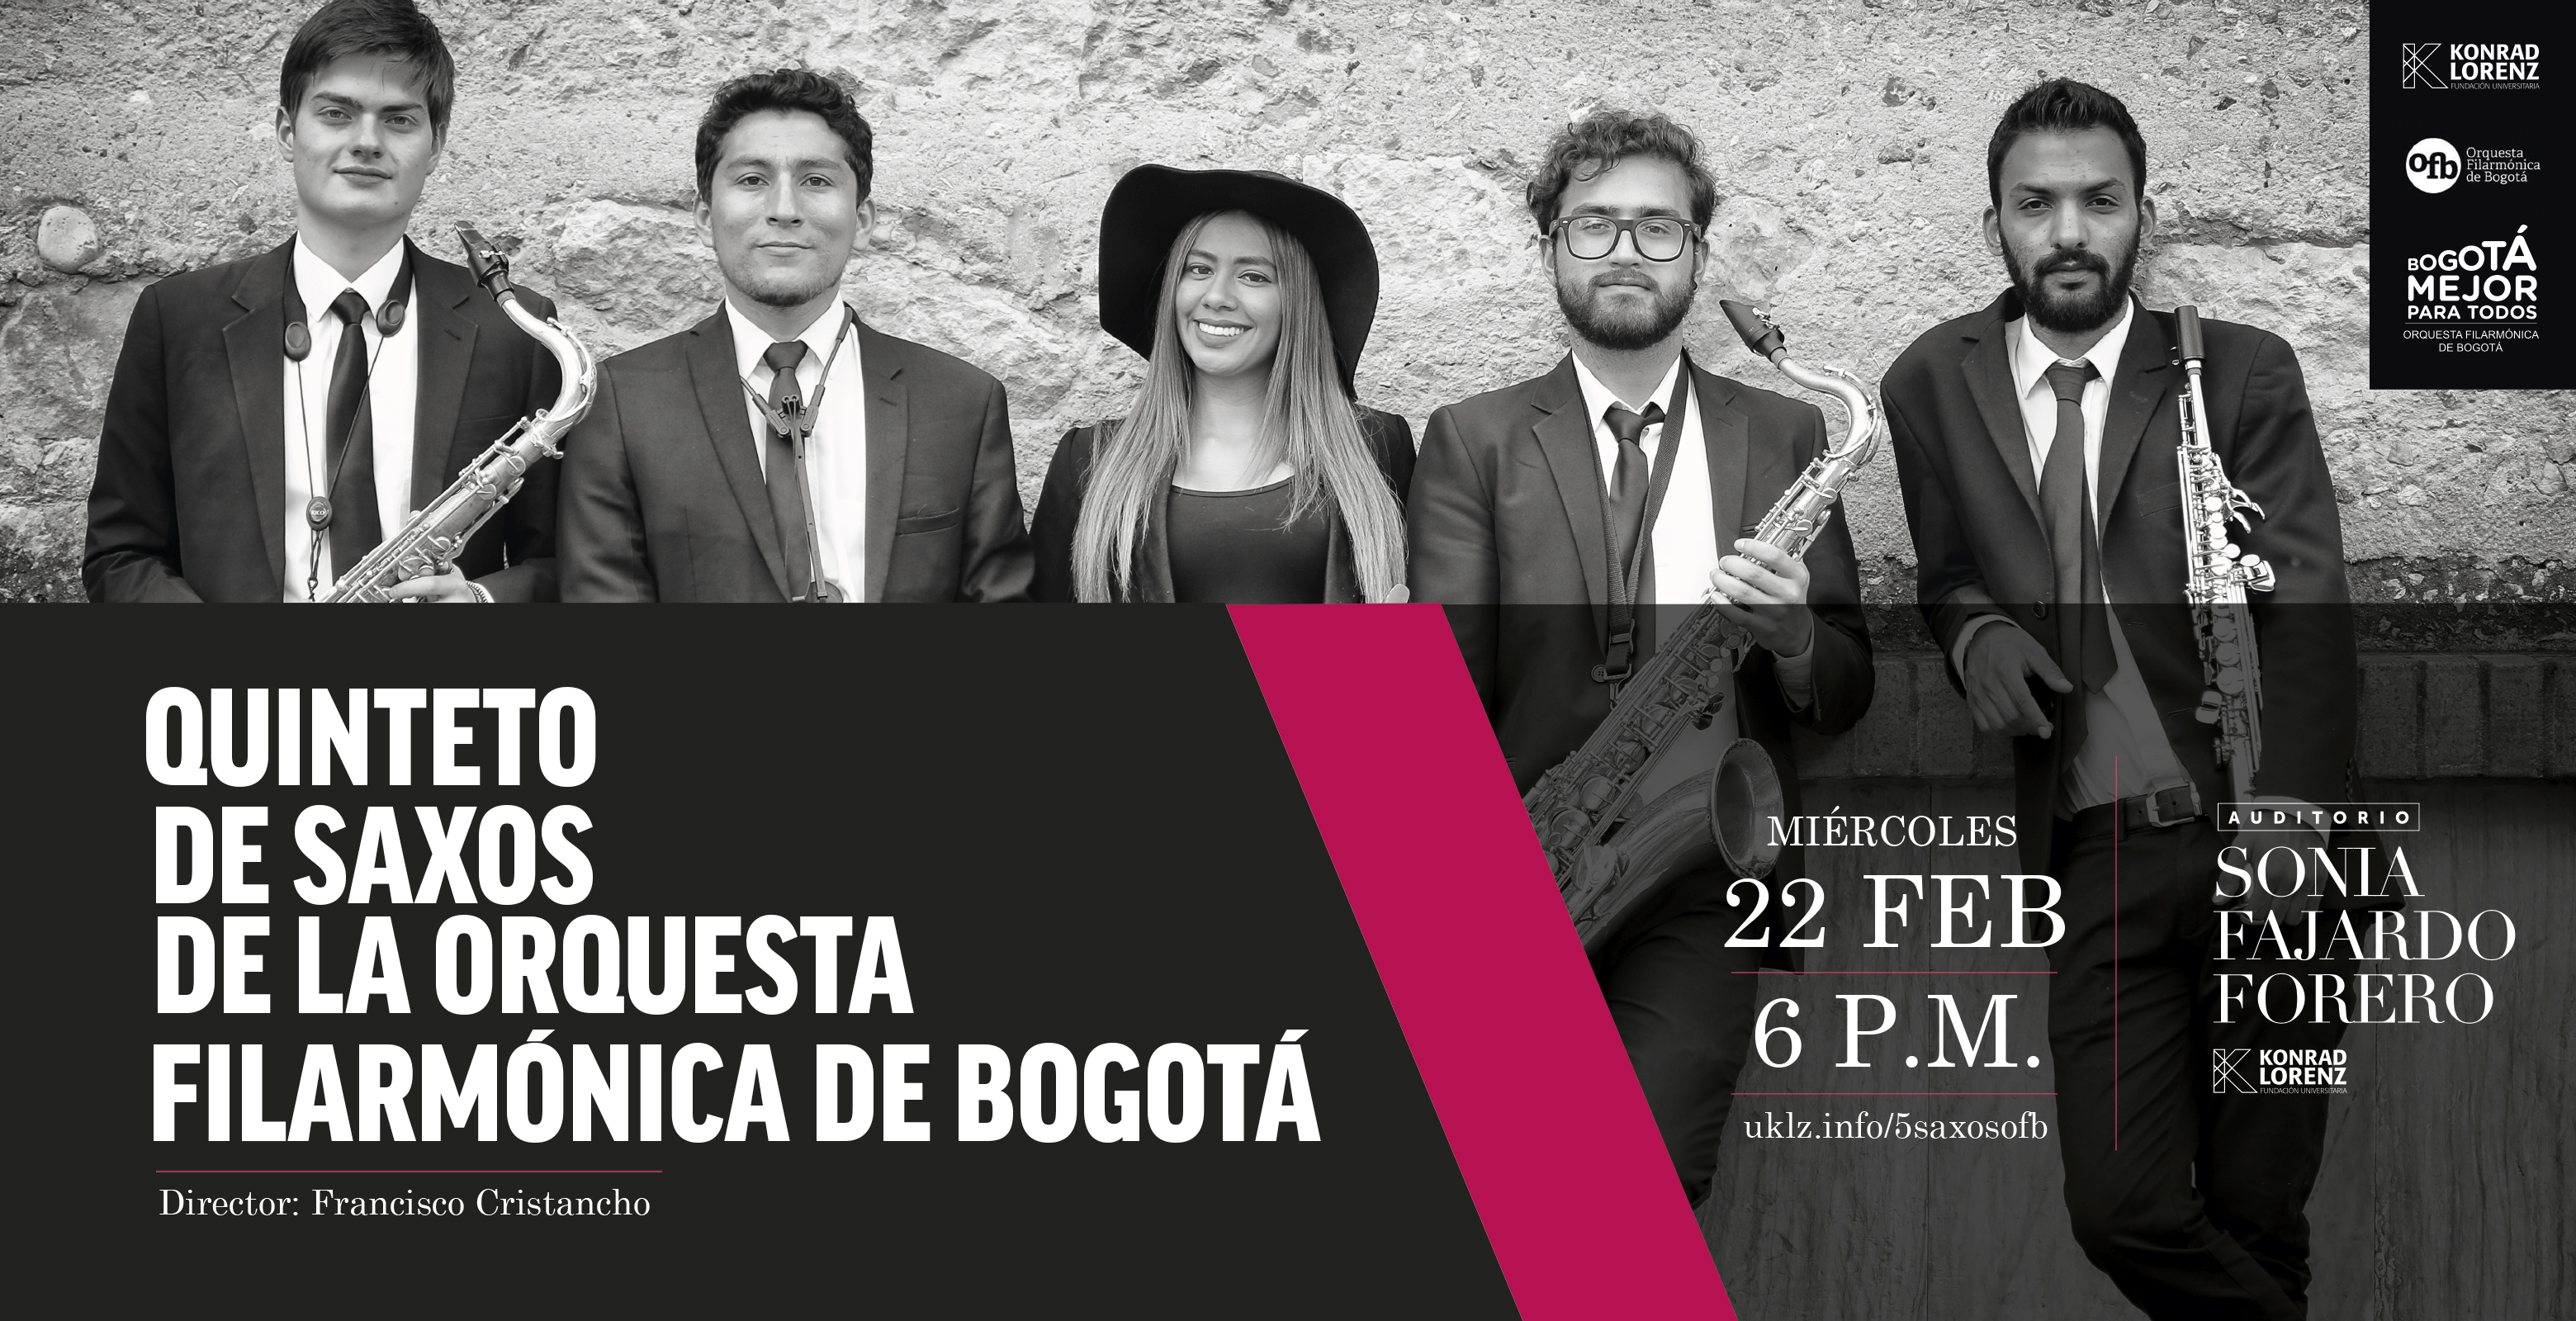 Quinteto de Saxos de la Orquesta Filarmónica de Bogotá